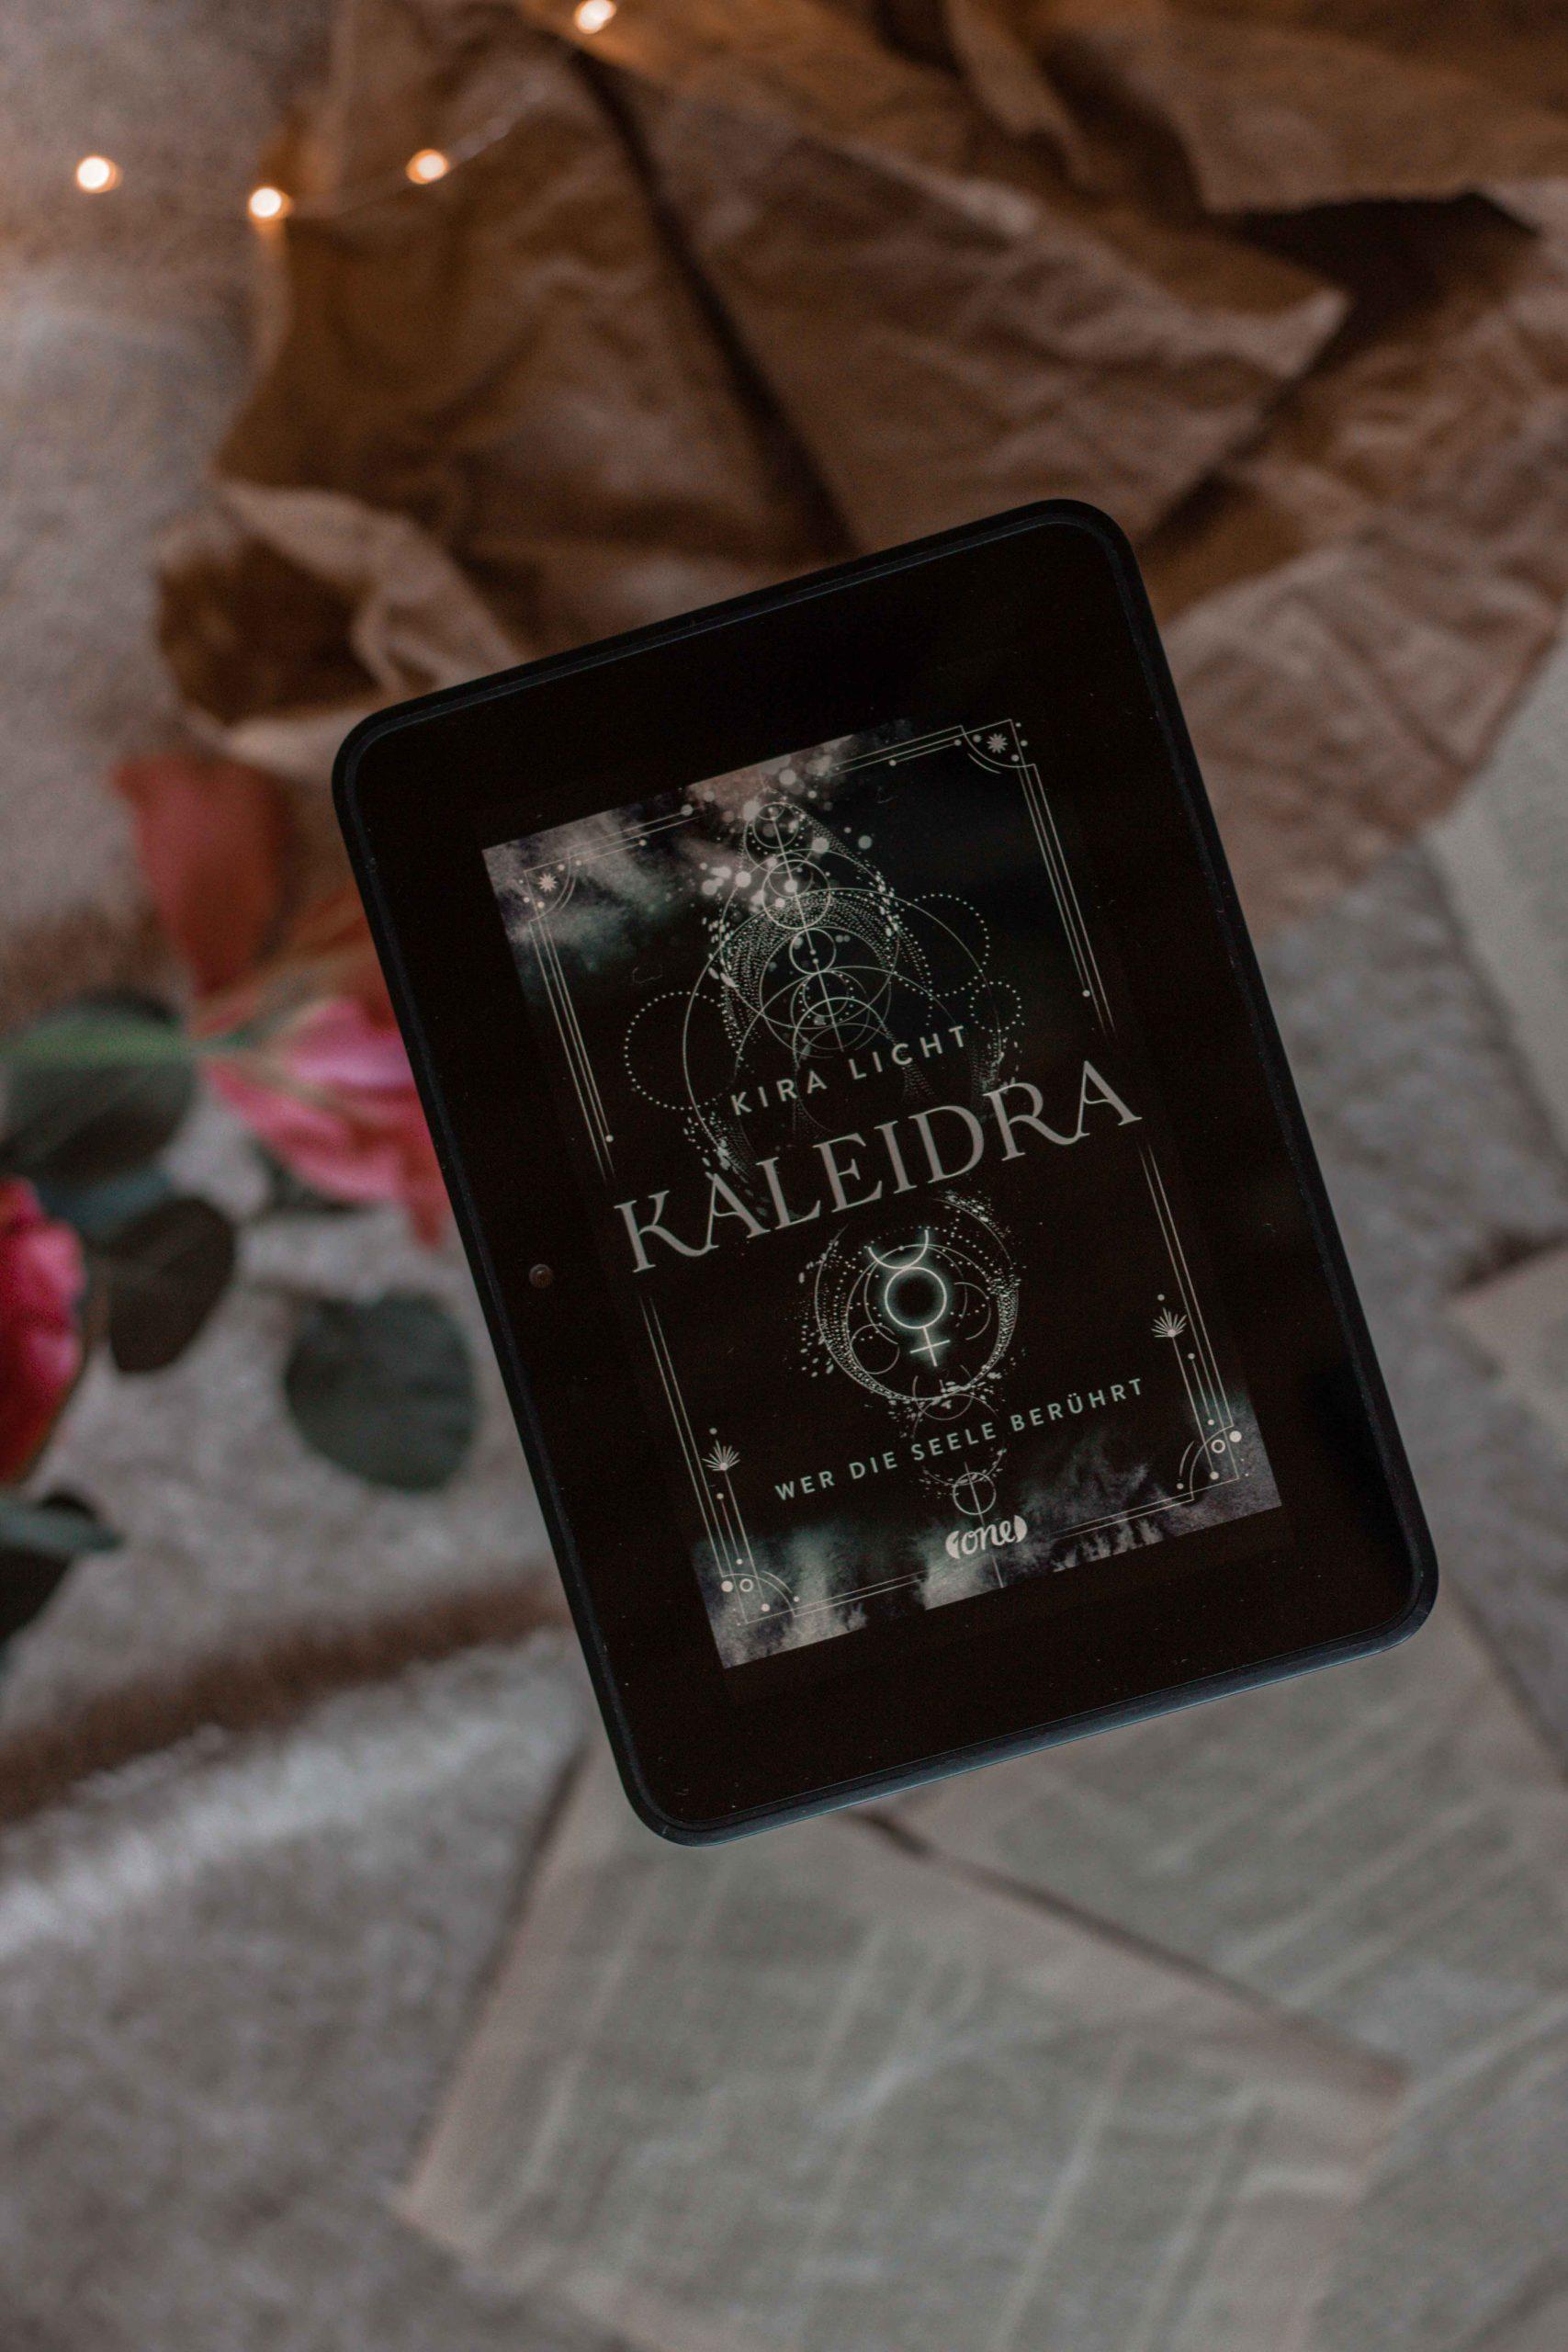 Wer die Seele berührt – Kaleidra #2   Kira Licht